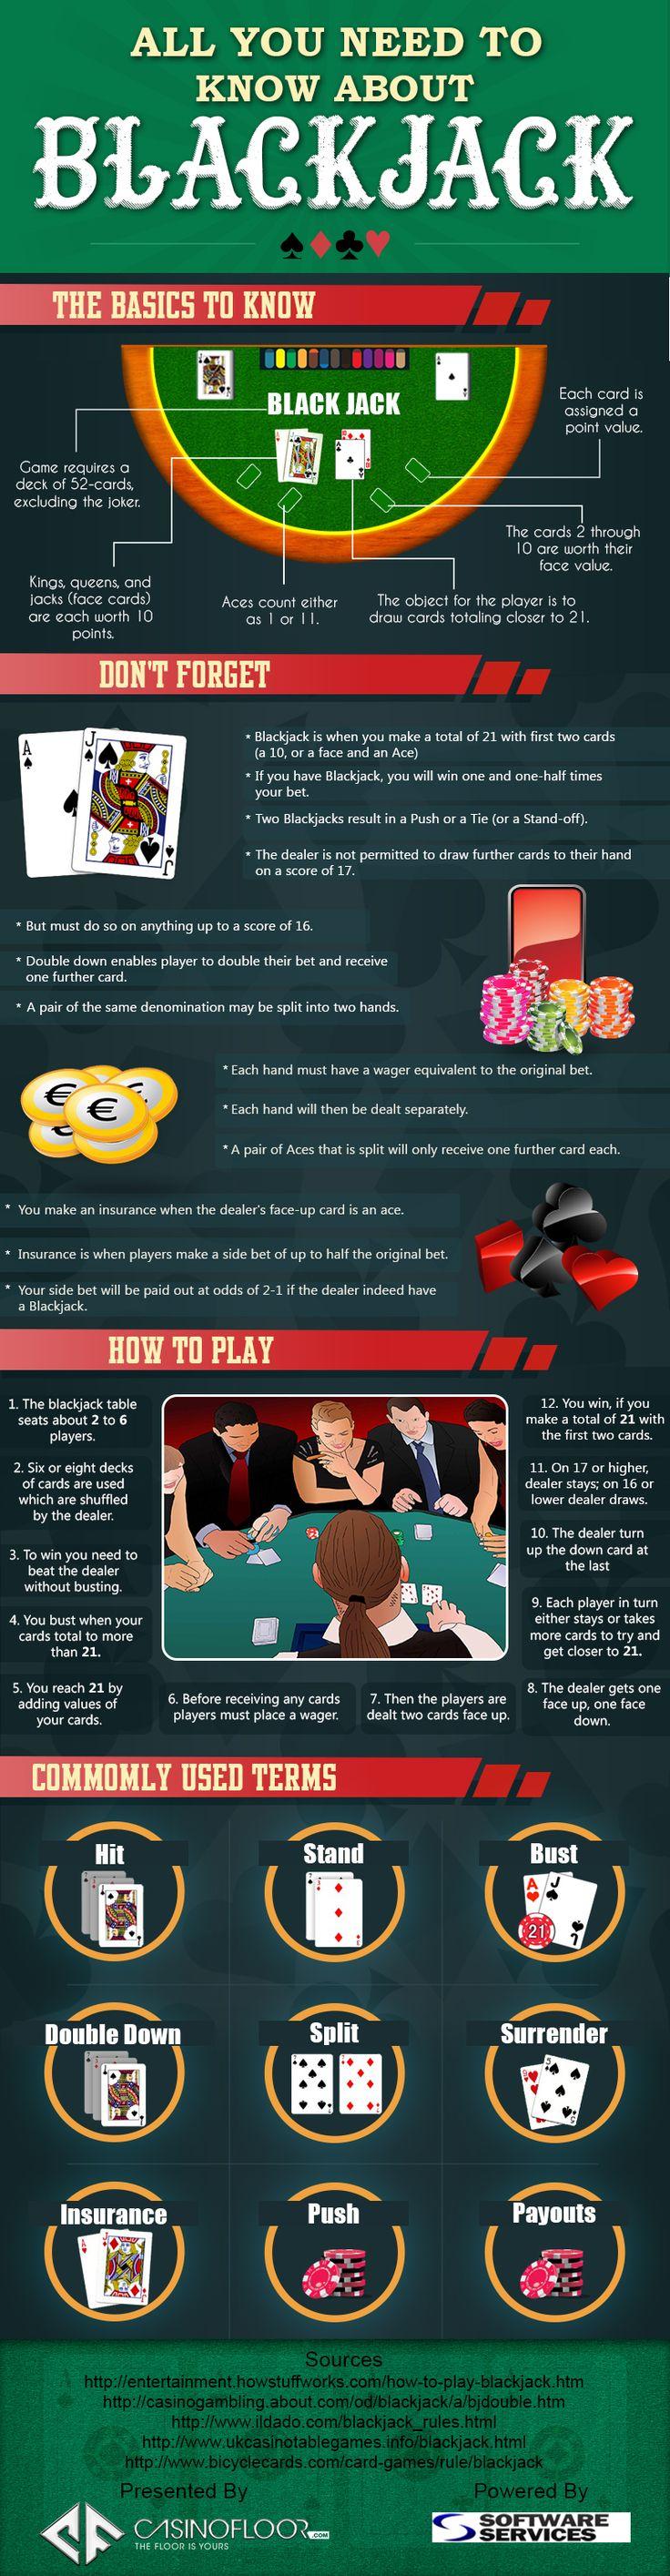 casino deutschland online casino games dice